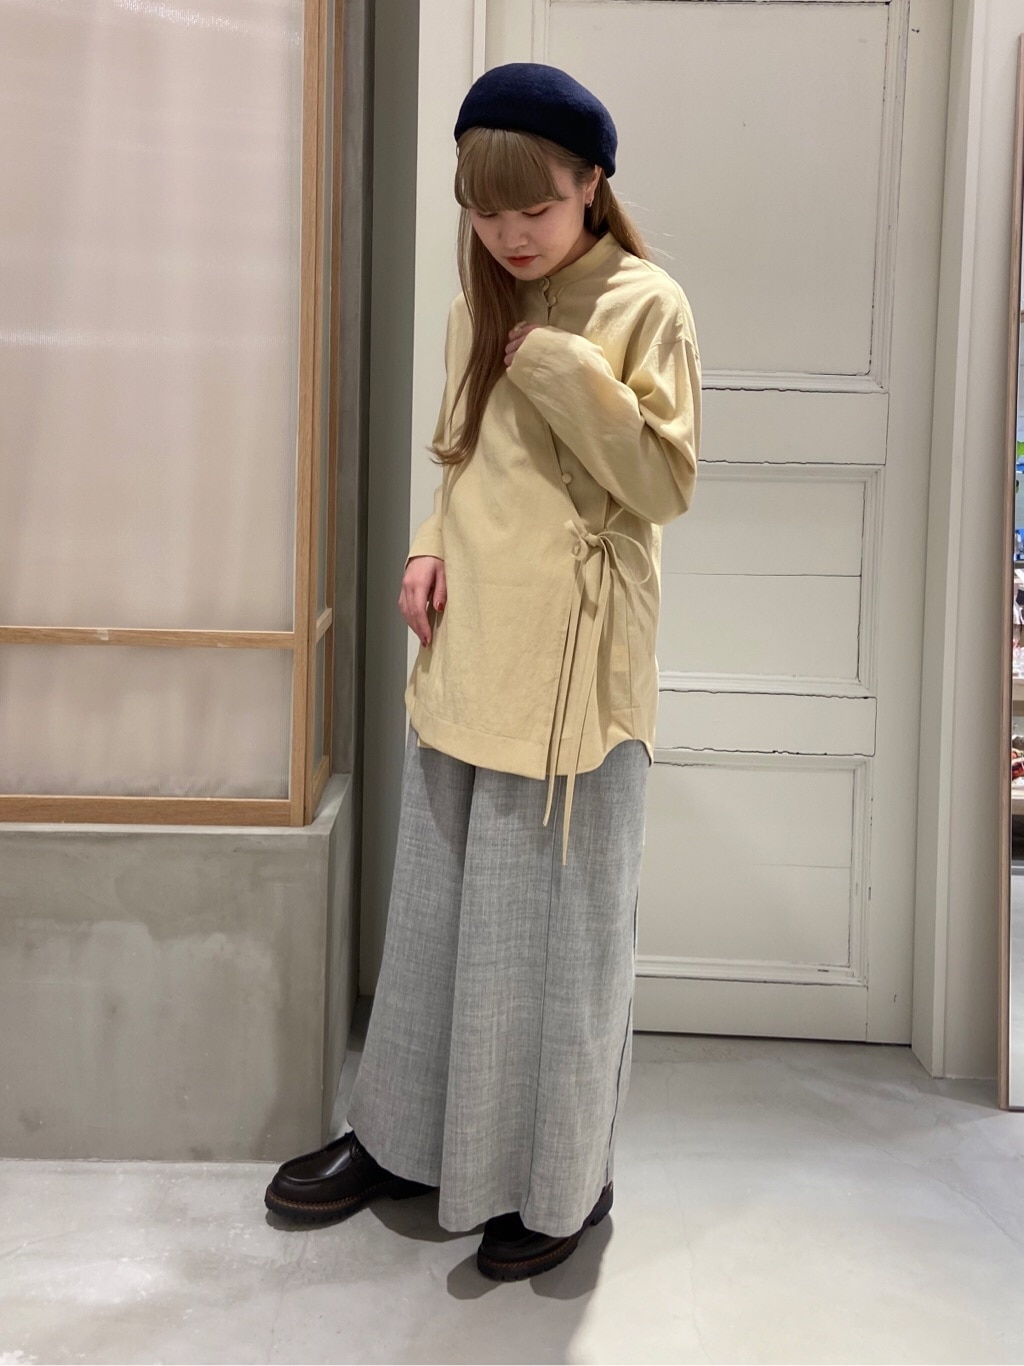 bulle de savon 渋谷スクランブルスクエア 身長:160cm 2020.12.16